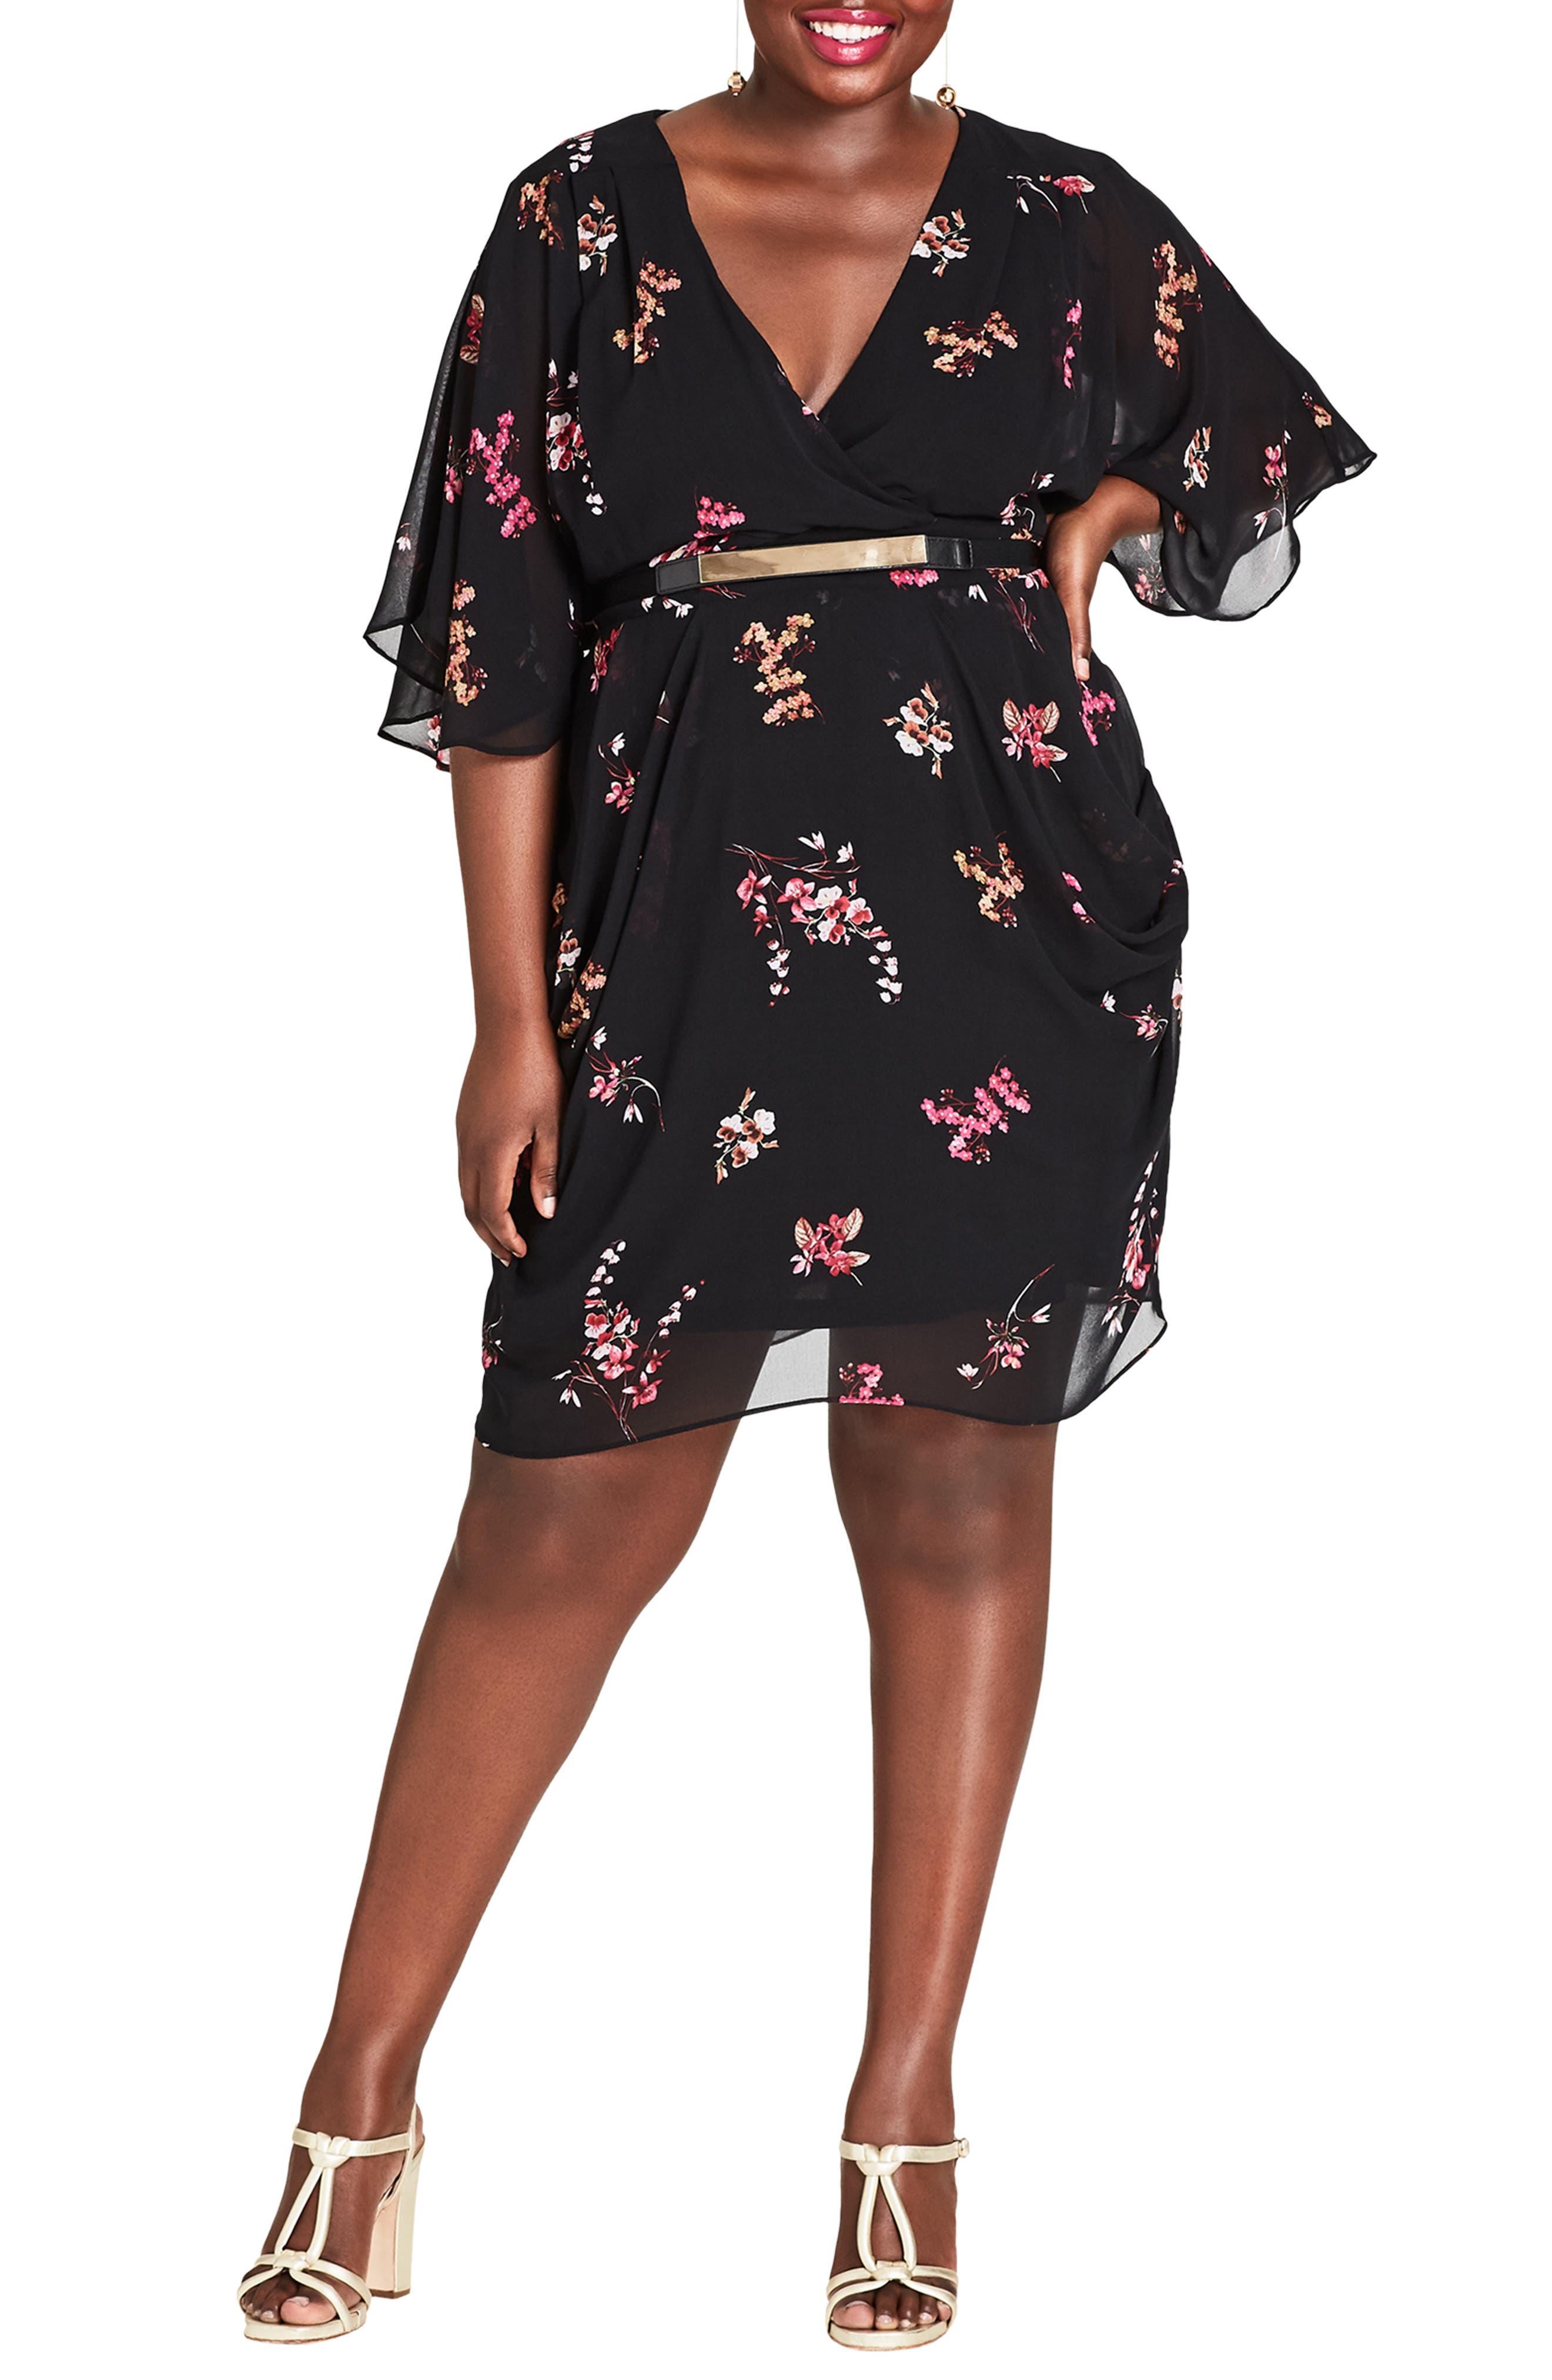 Plus Size City Chic Akari Floral Dress, Black